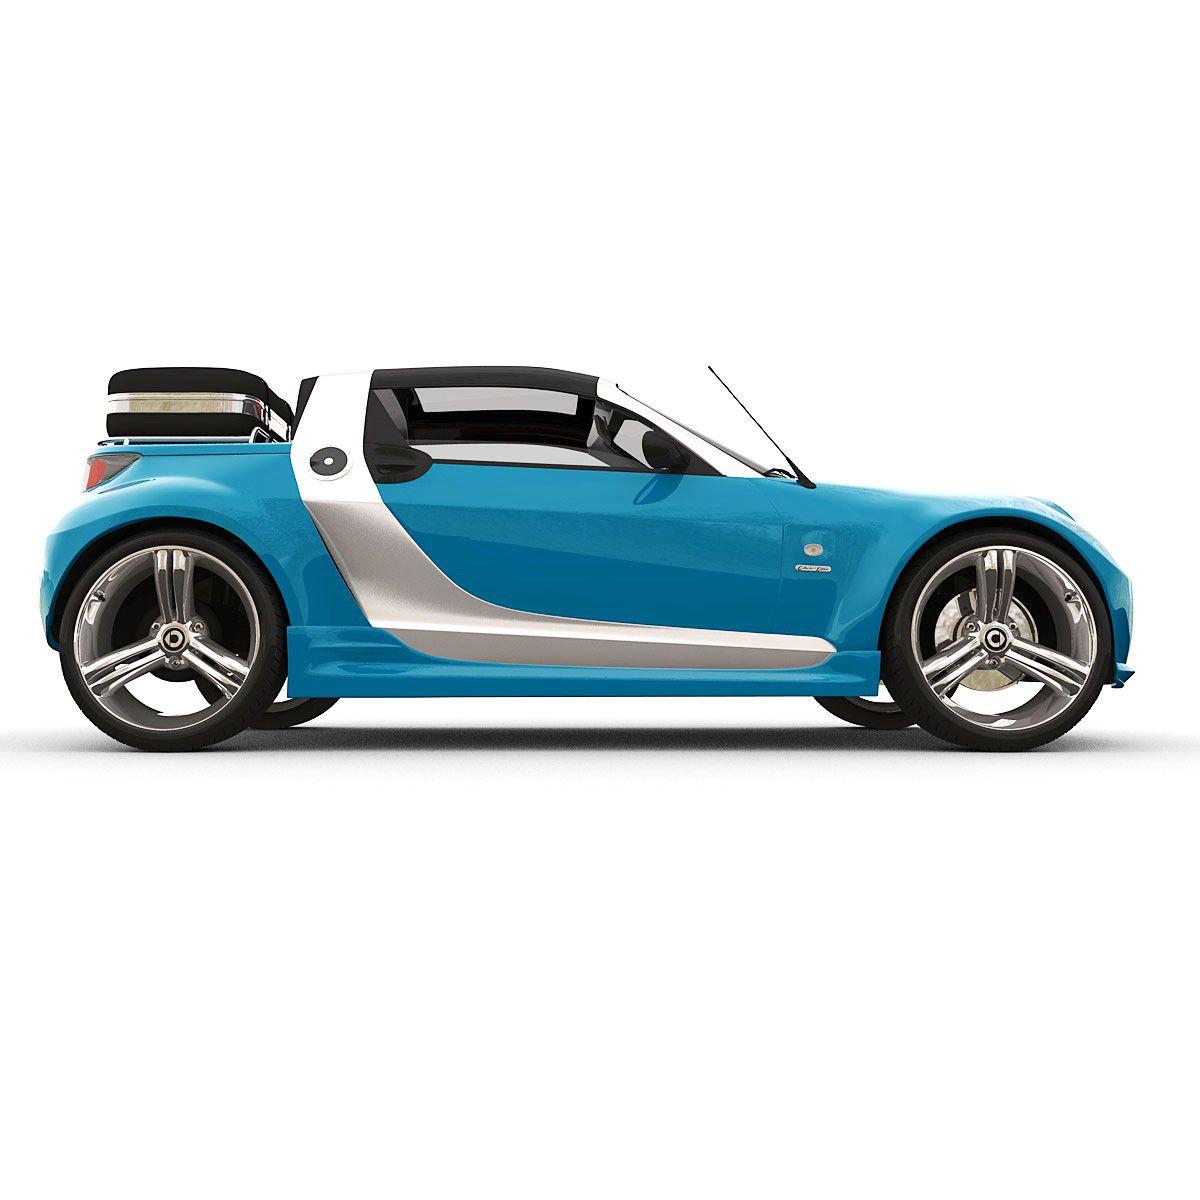 Smart Roadster Brabus Traveler 3d Model Autos Coches Coches De